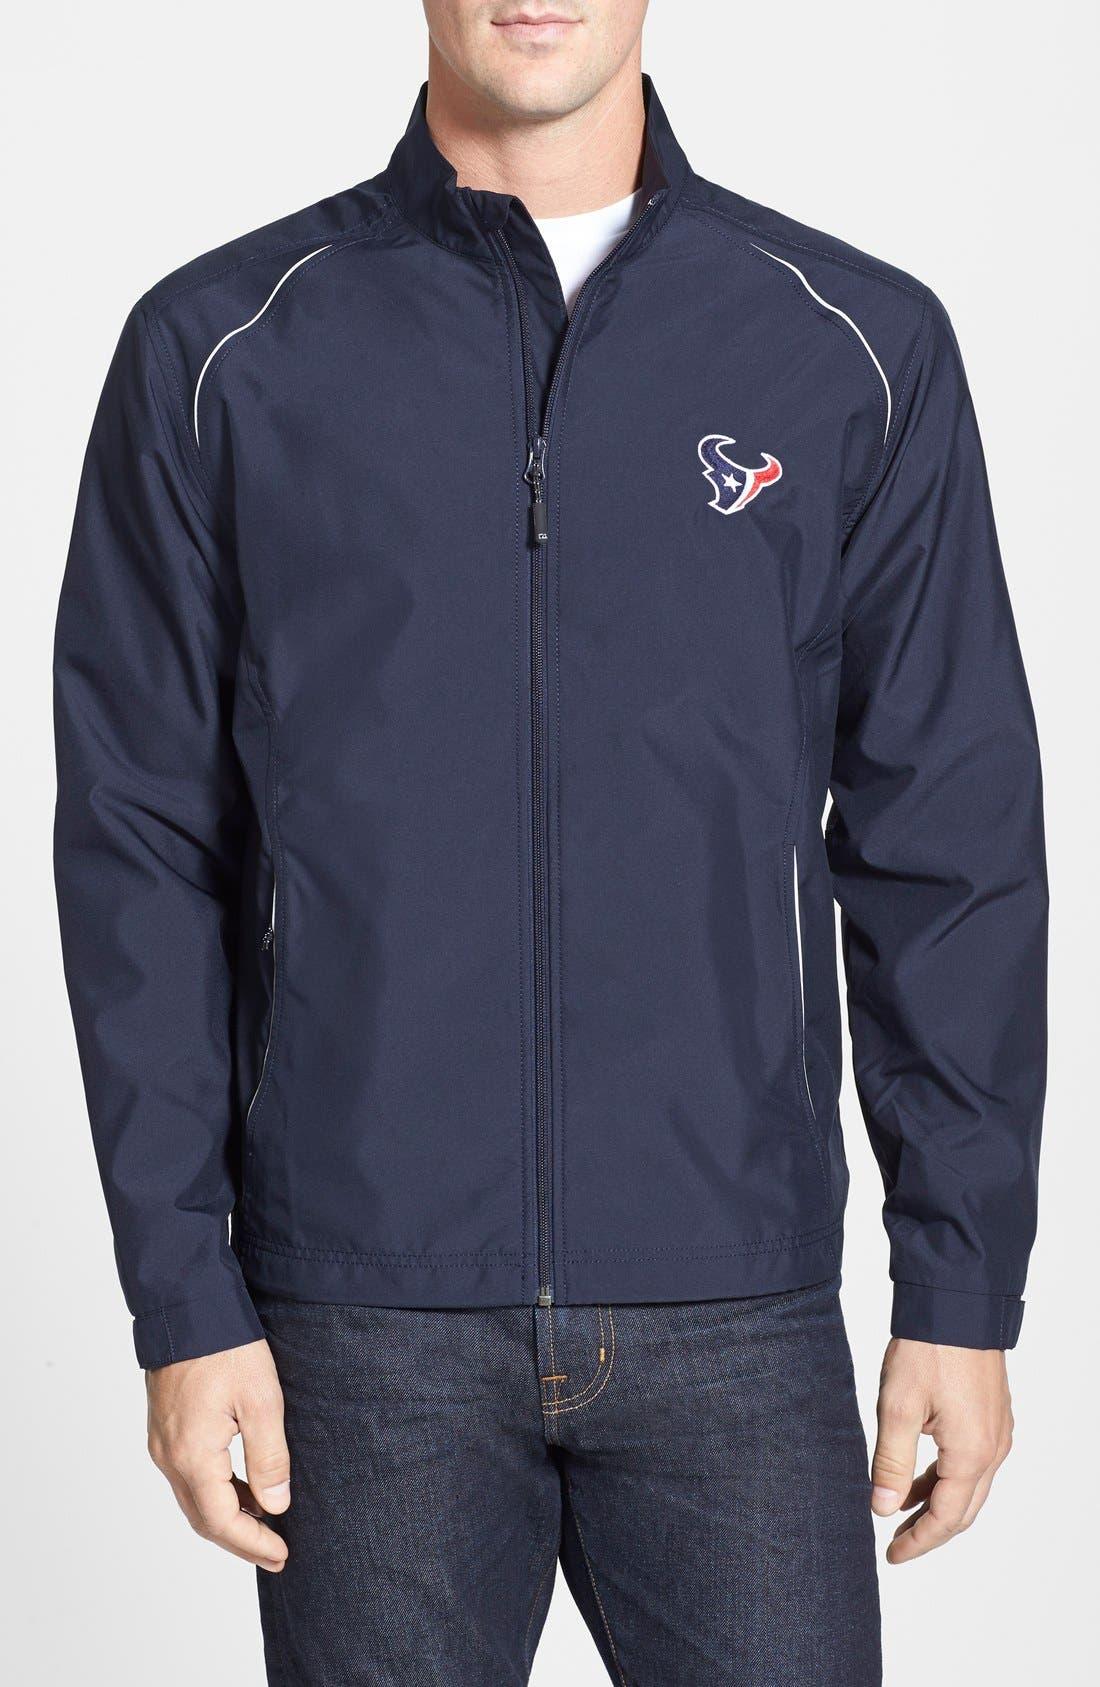 Houston Texans - Beacon WeatherTec Wind & Water Resistant Jacket,                         Main,                         color, Navy Blue